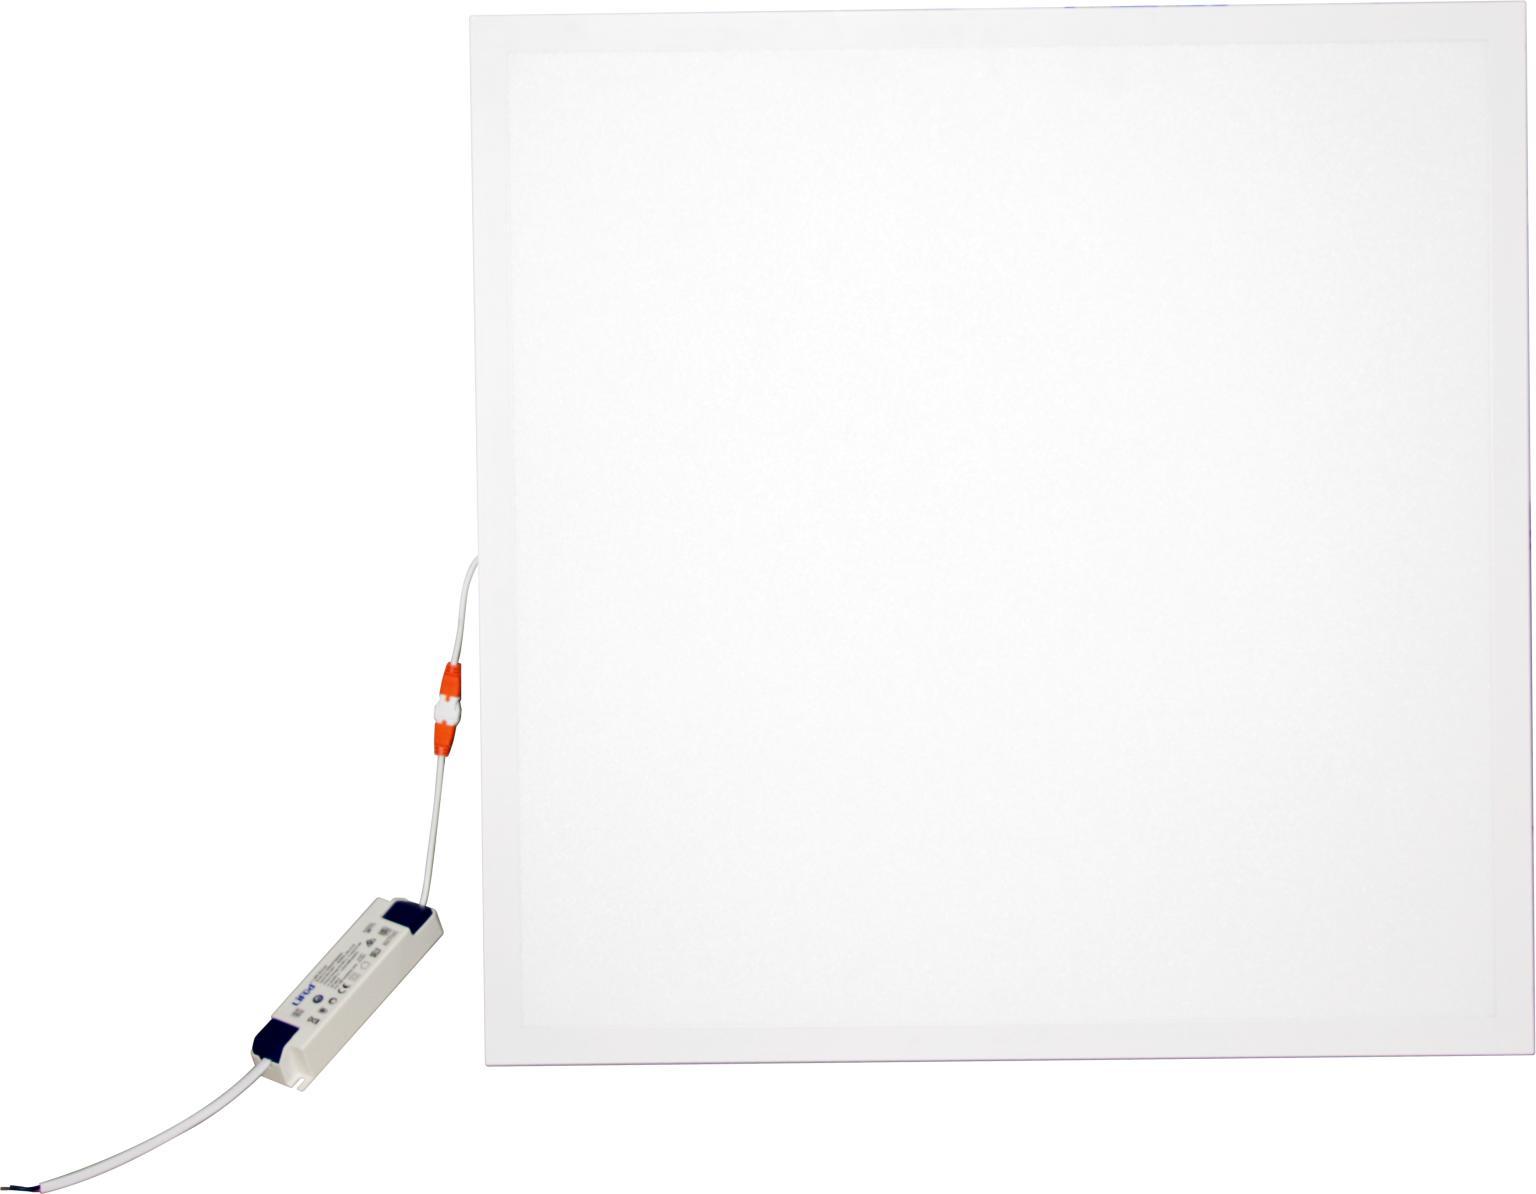 Backlit panel light 150lm/w 595x595mm 25W economy version for retail market